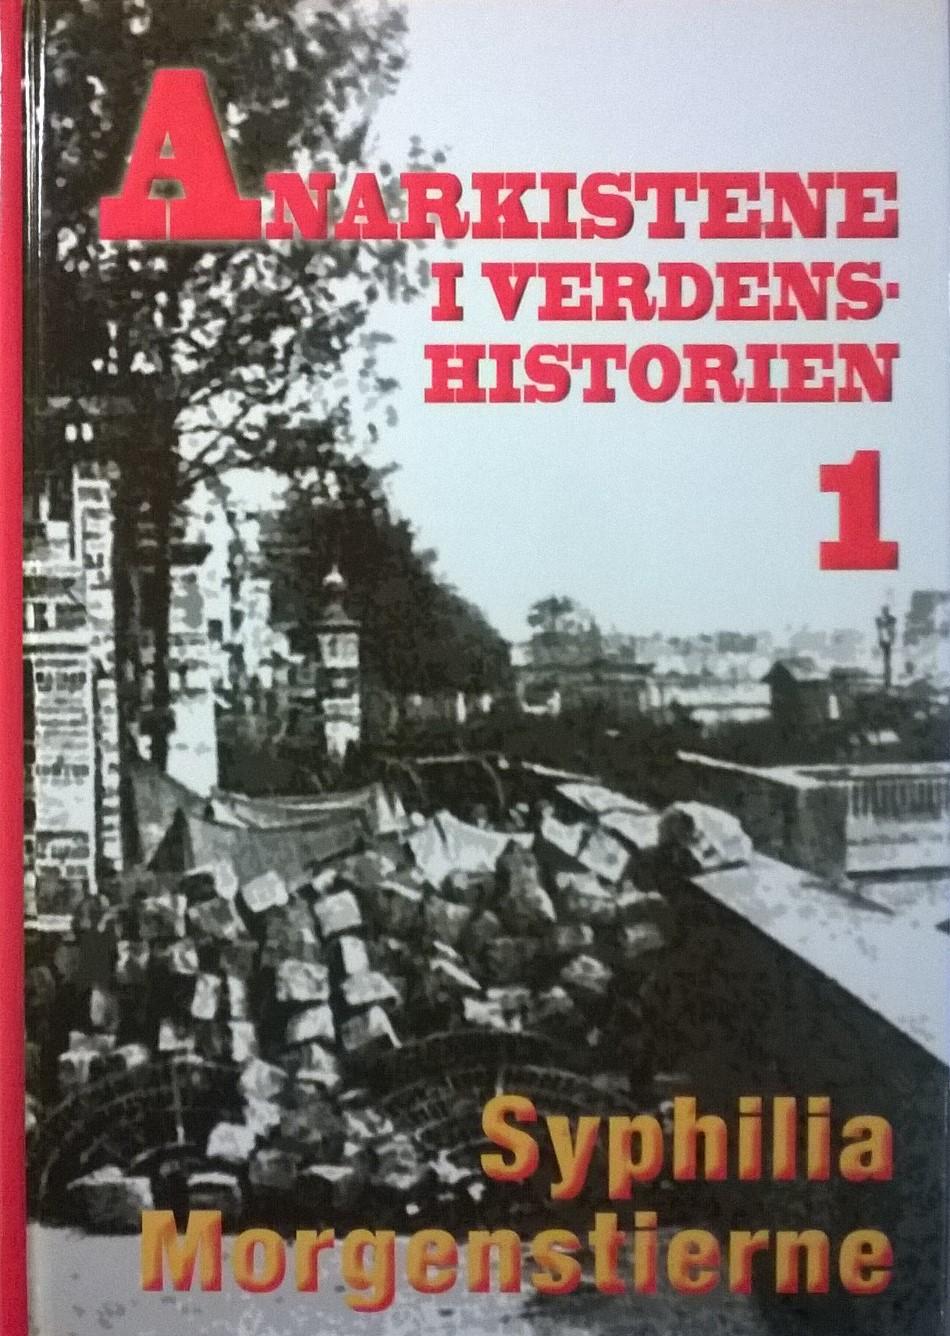 Morgenstierne, Syphilia [Mari Toft] Anarkistene i verdenshistorien 1